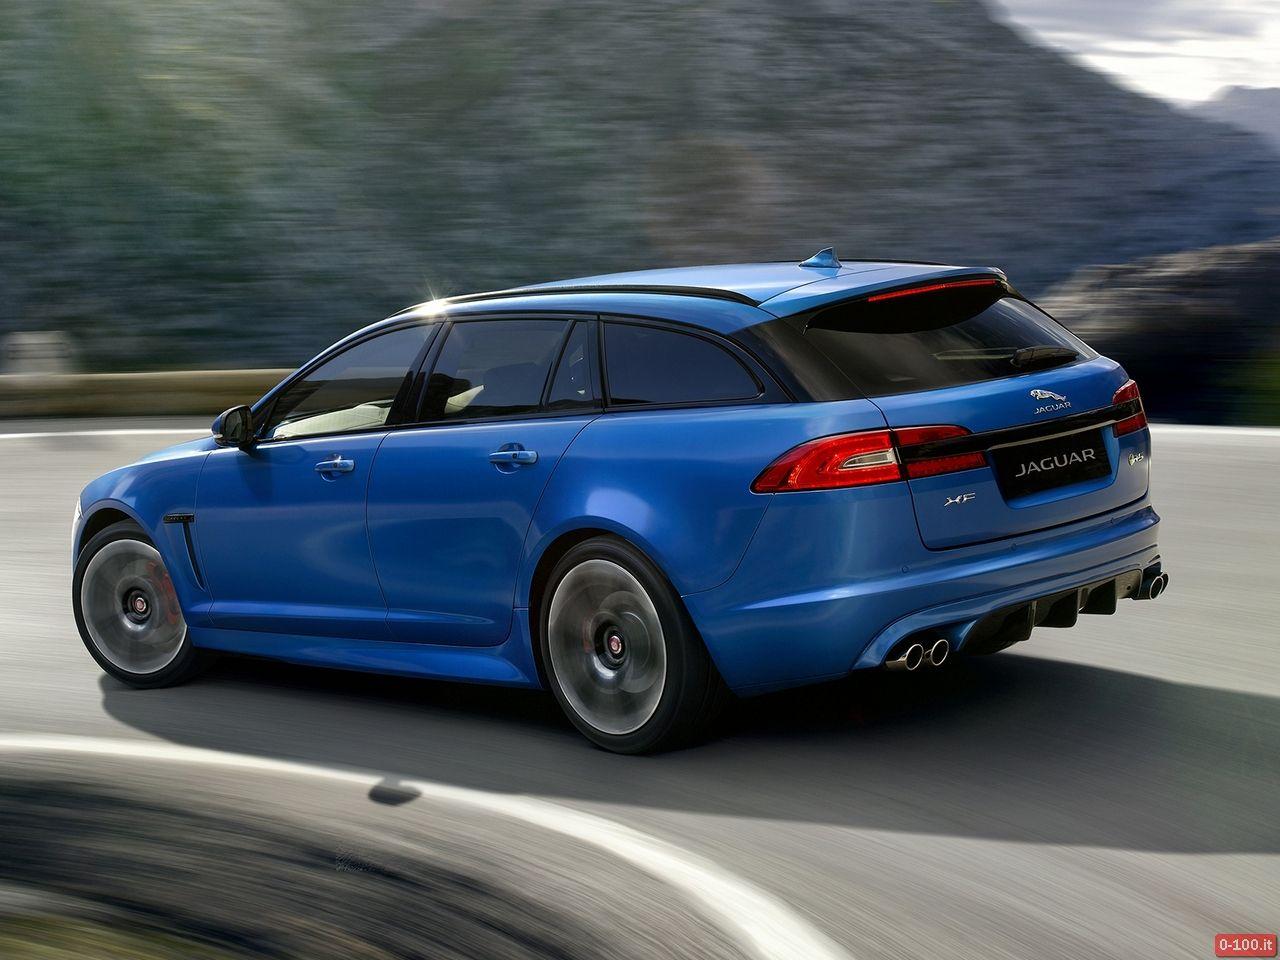 ginevra-2014-jaguar-xf-model-year-2015-xfr-s-sportbrake-0-100_39